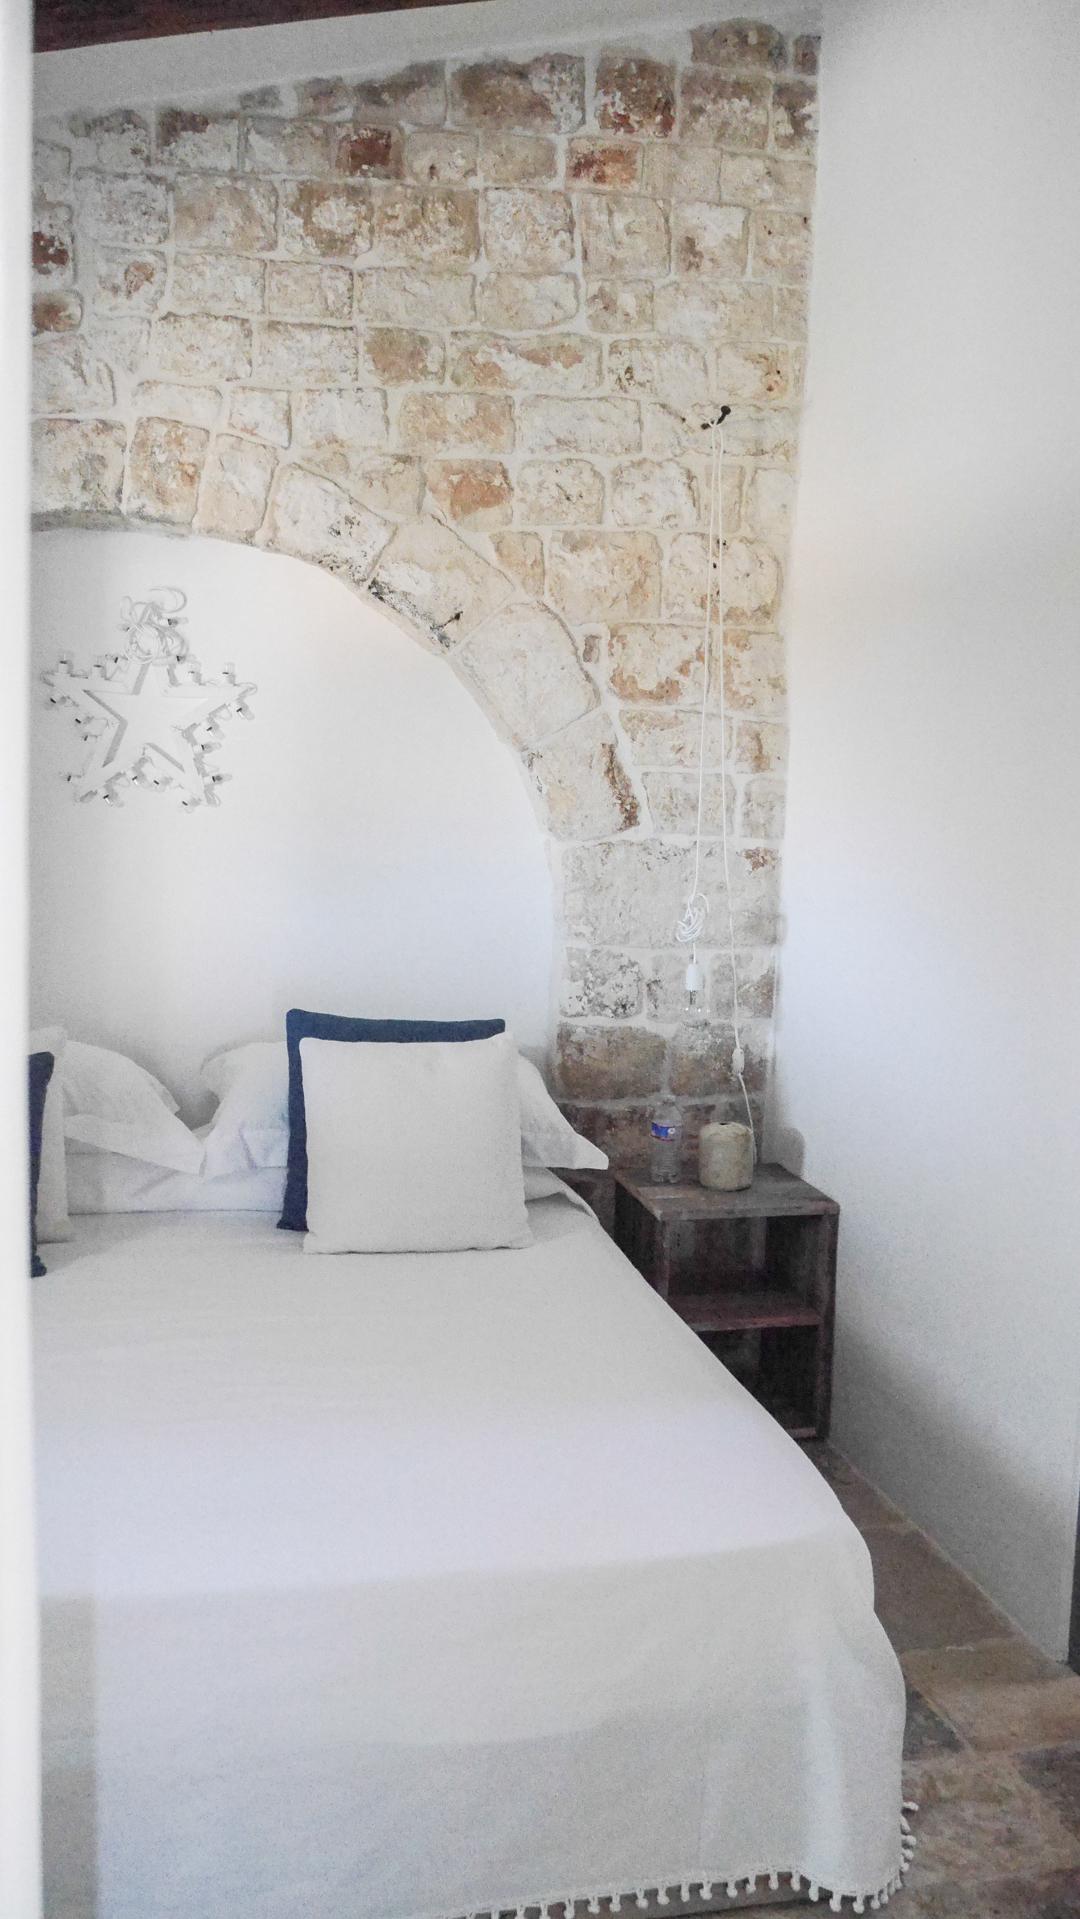 Nina Trulli - luxury hotel for modern rustic interior lovers